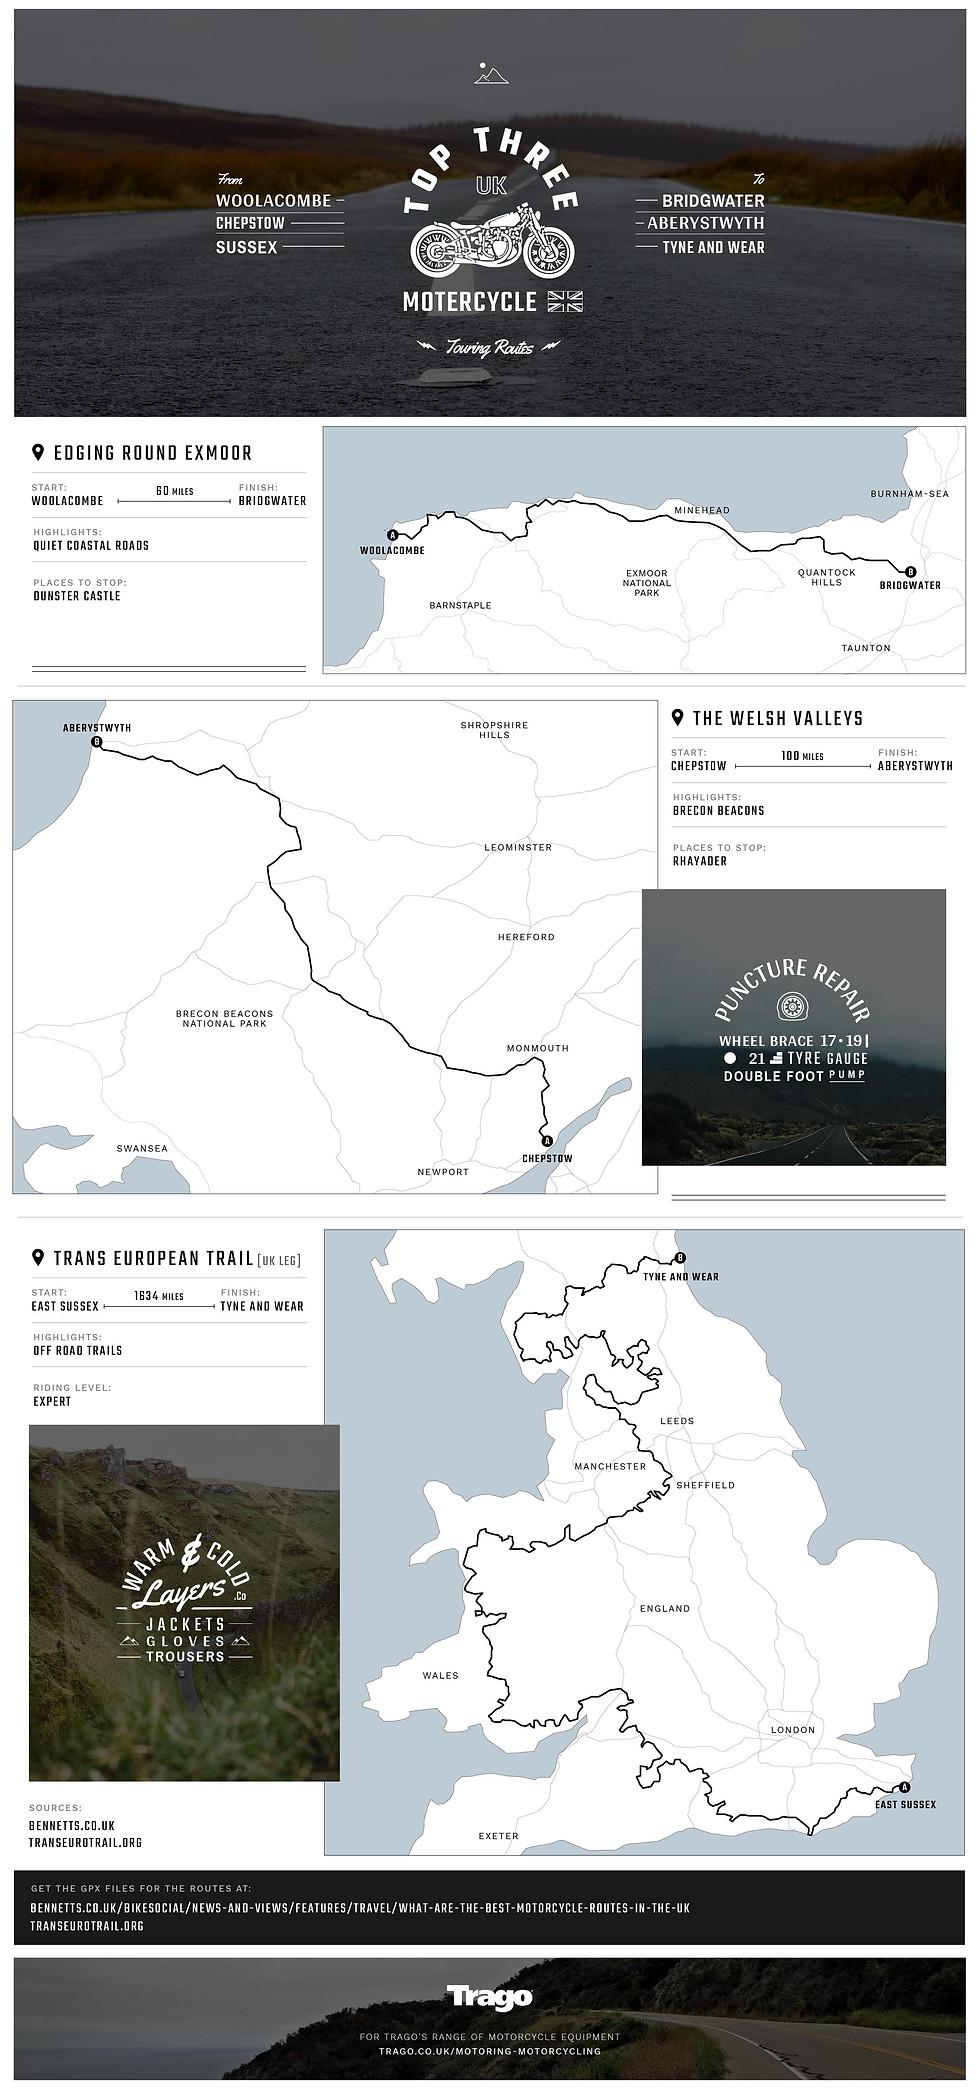 Trago_Top_3_routes.jpg